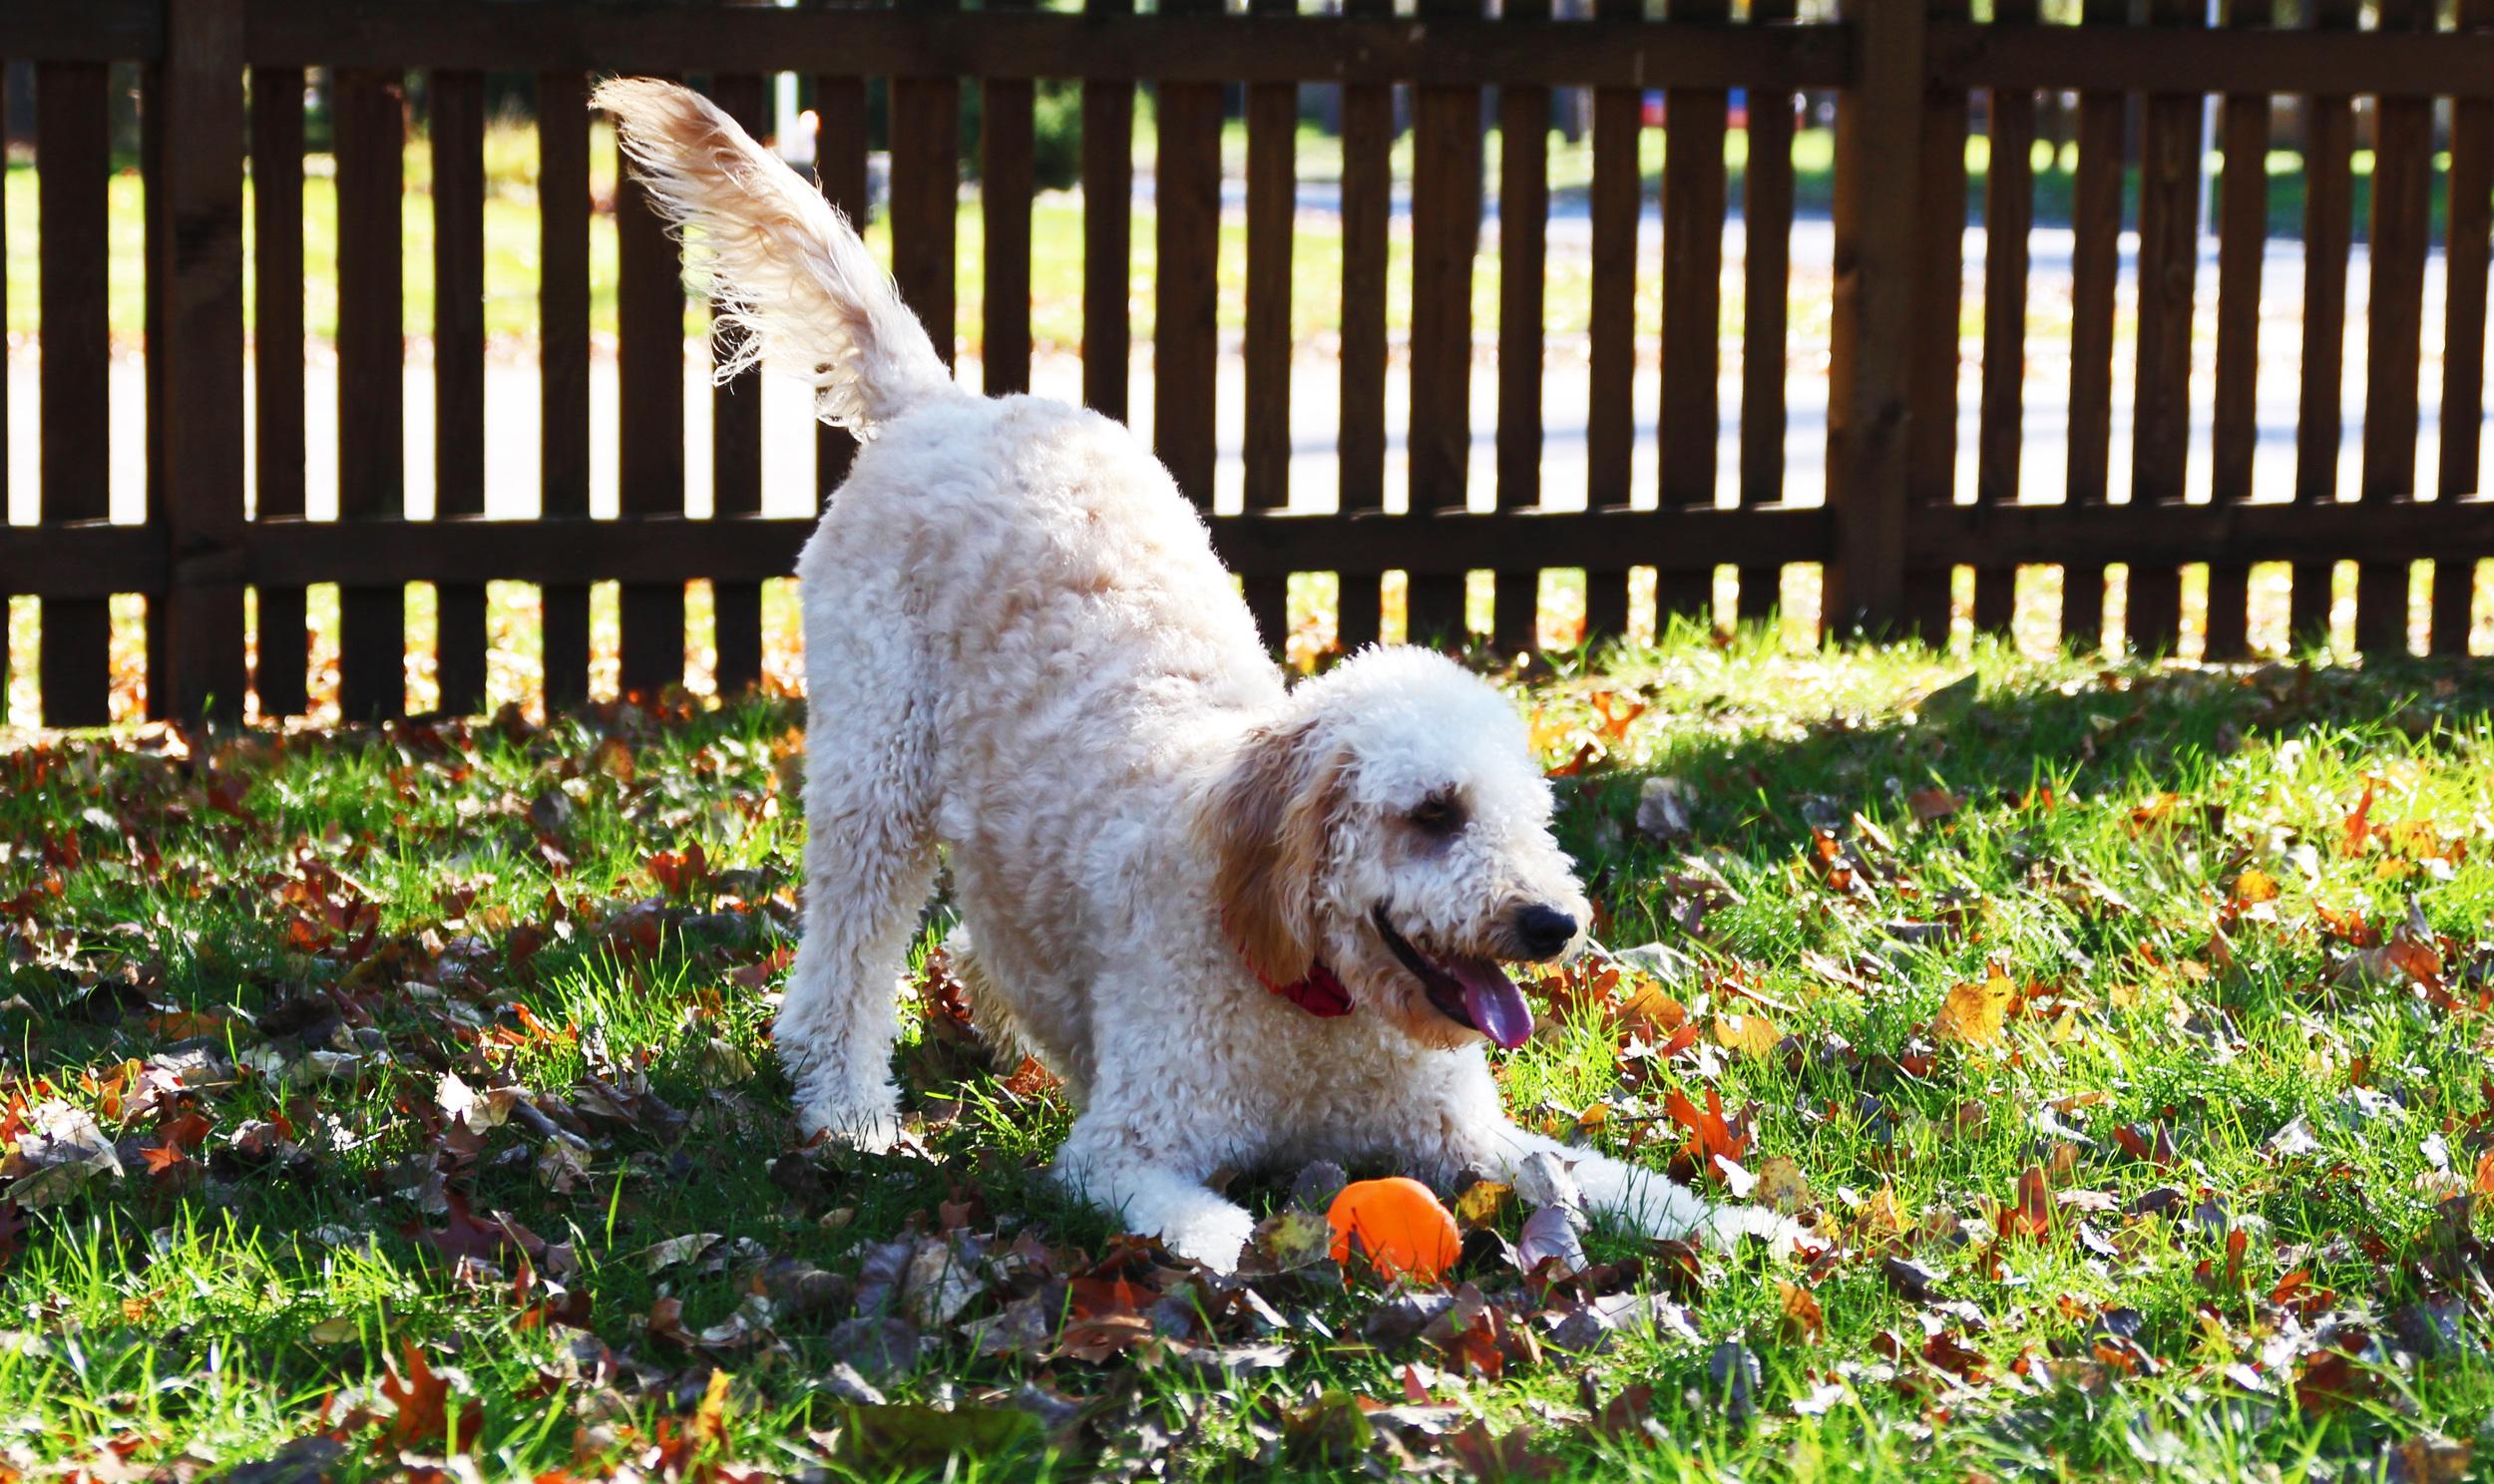 louies new pumpkin3.jpg